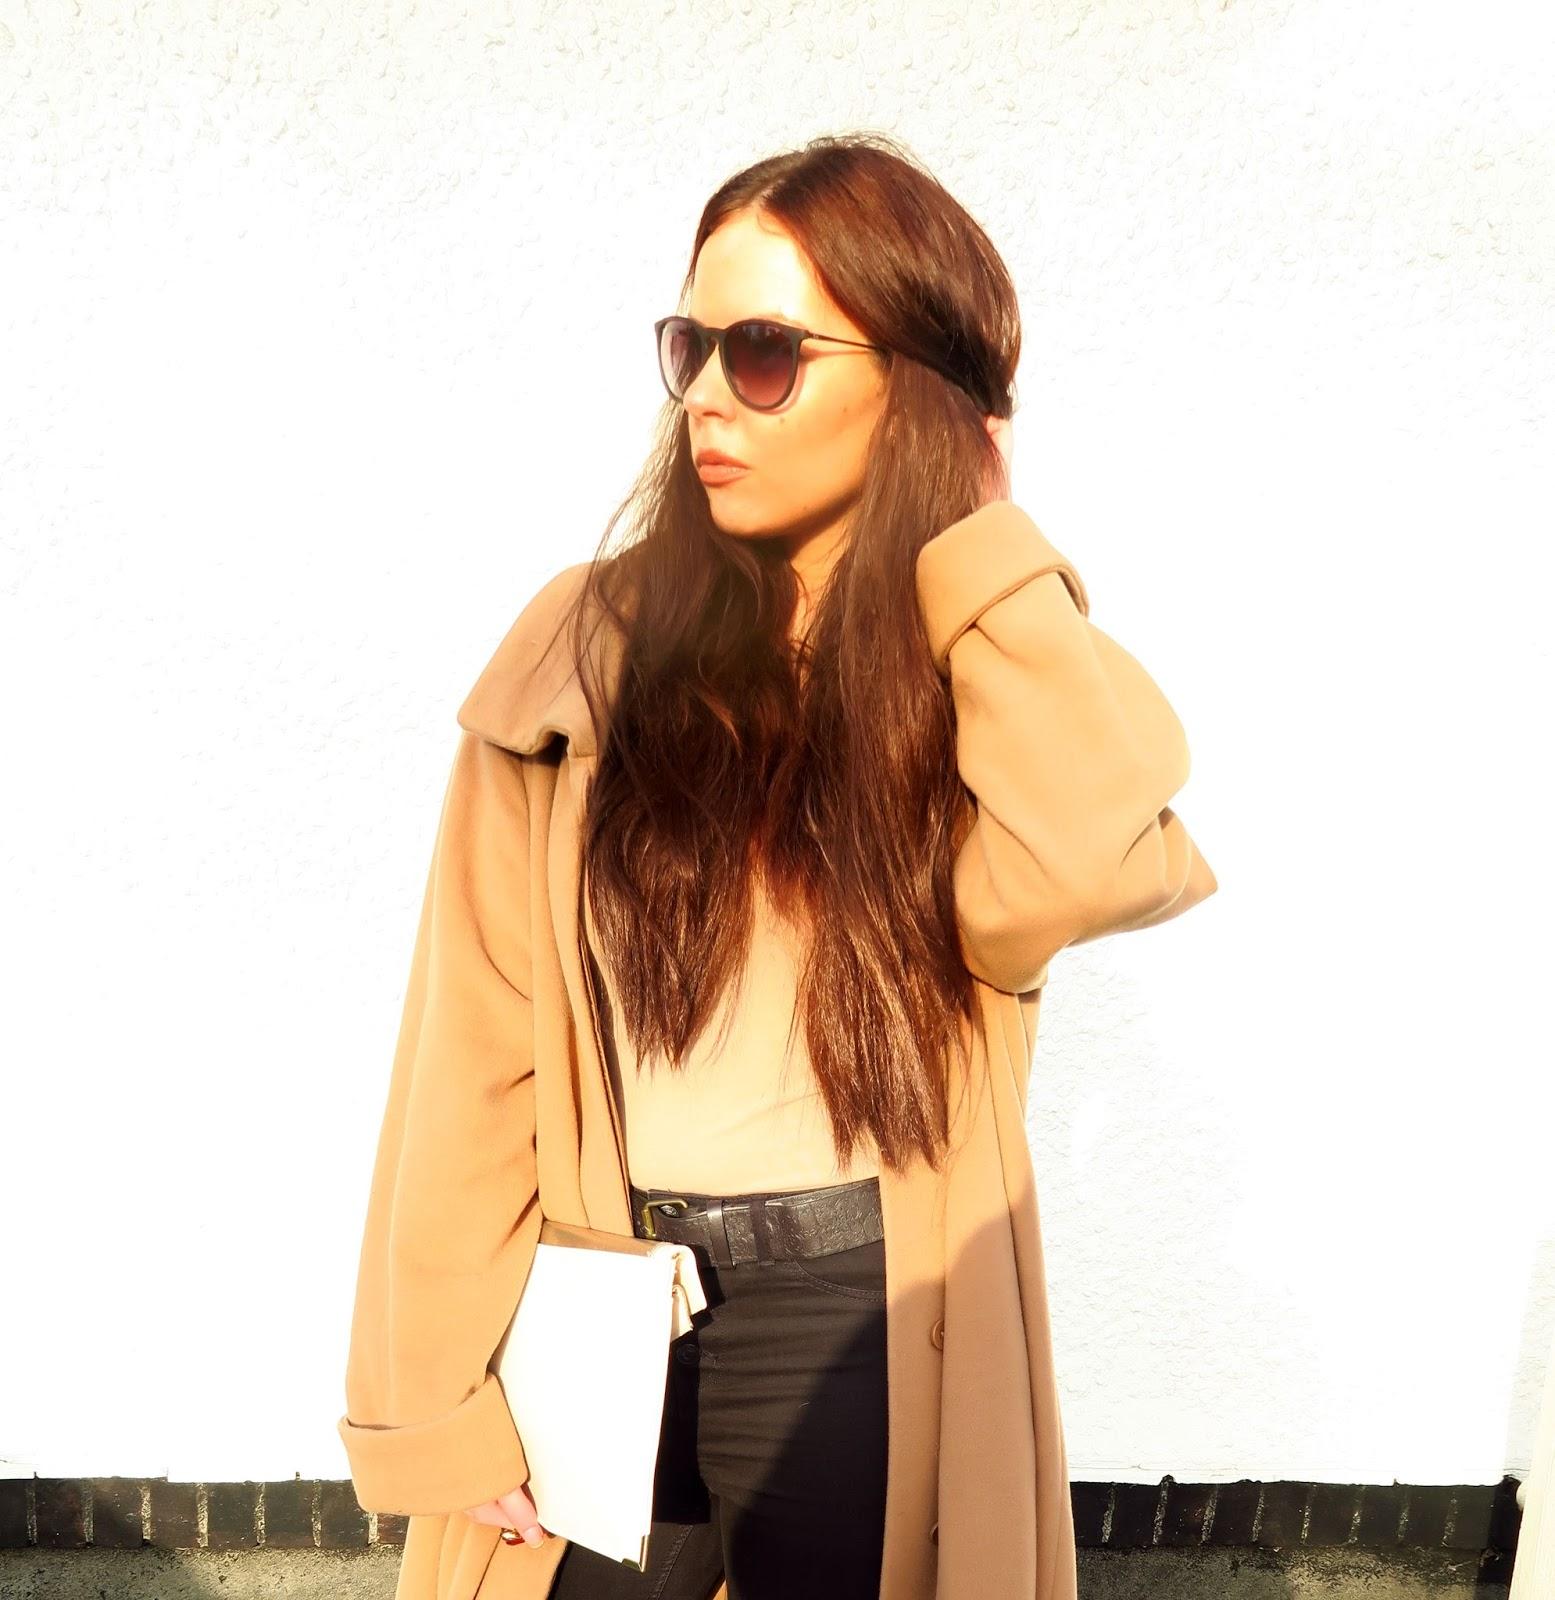 Ray-ban-erika-sunglasses @ hayleyeszti